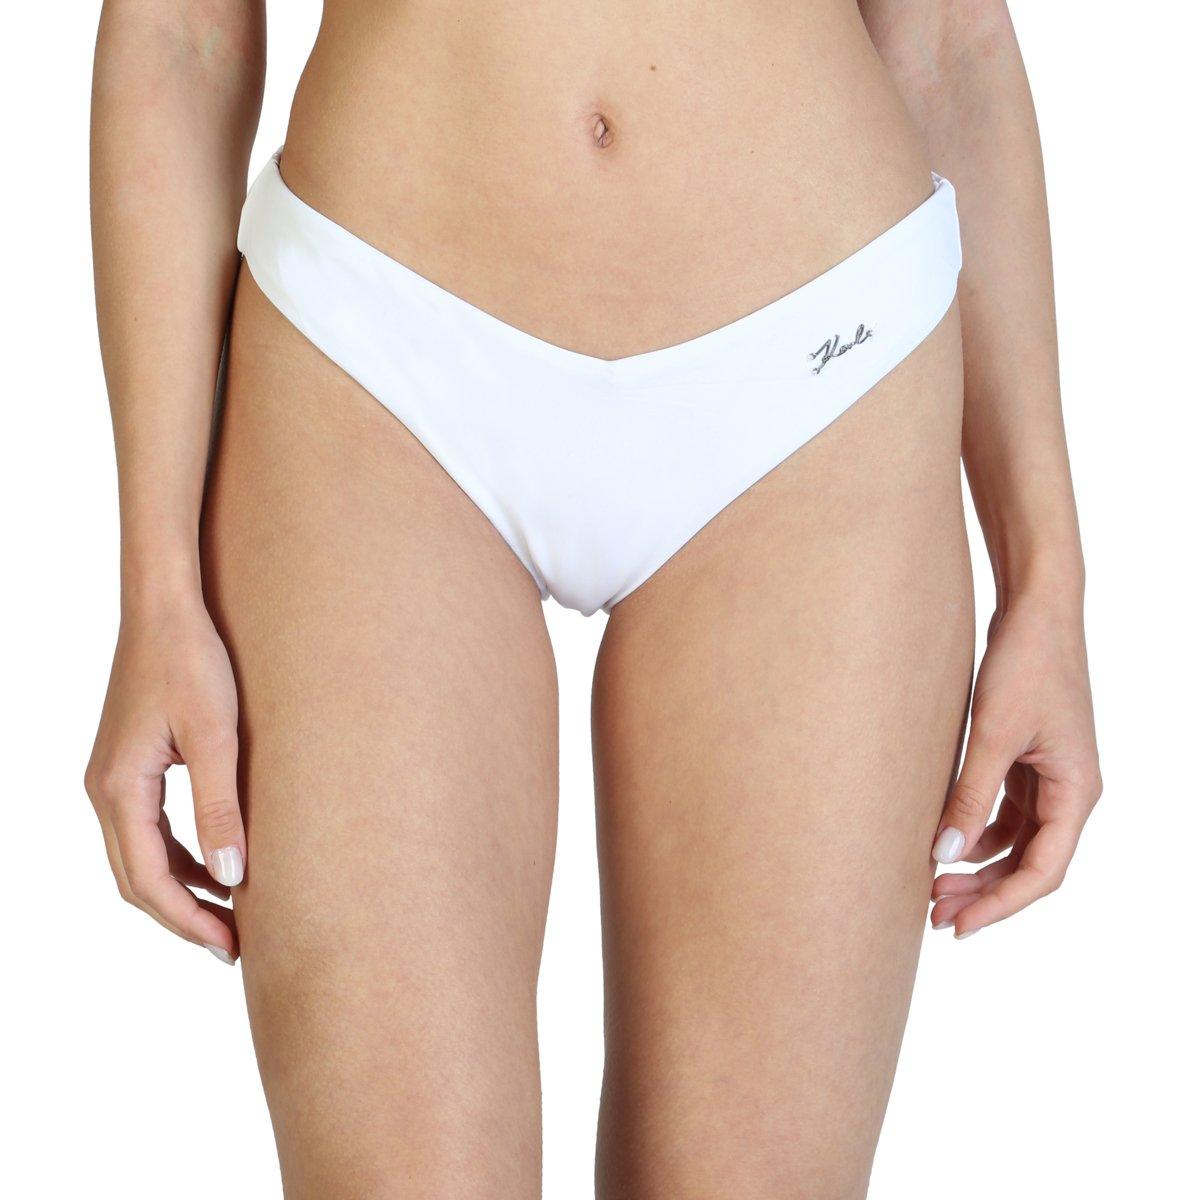 Karl Lagerfeld Women's Swimwear Underwear Various Colours KL21WBT05 - white XS